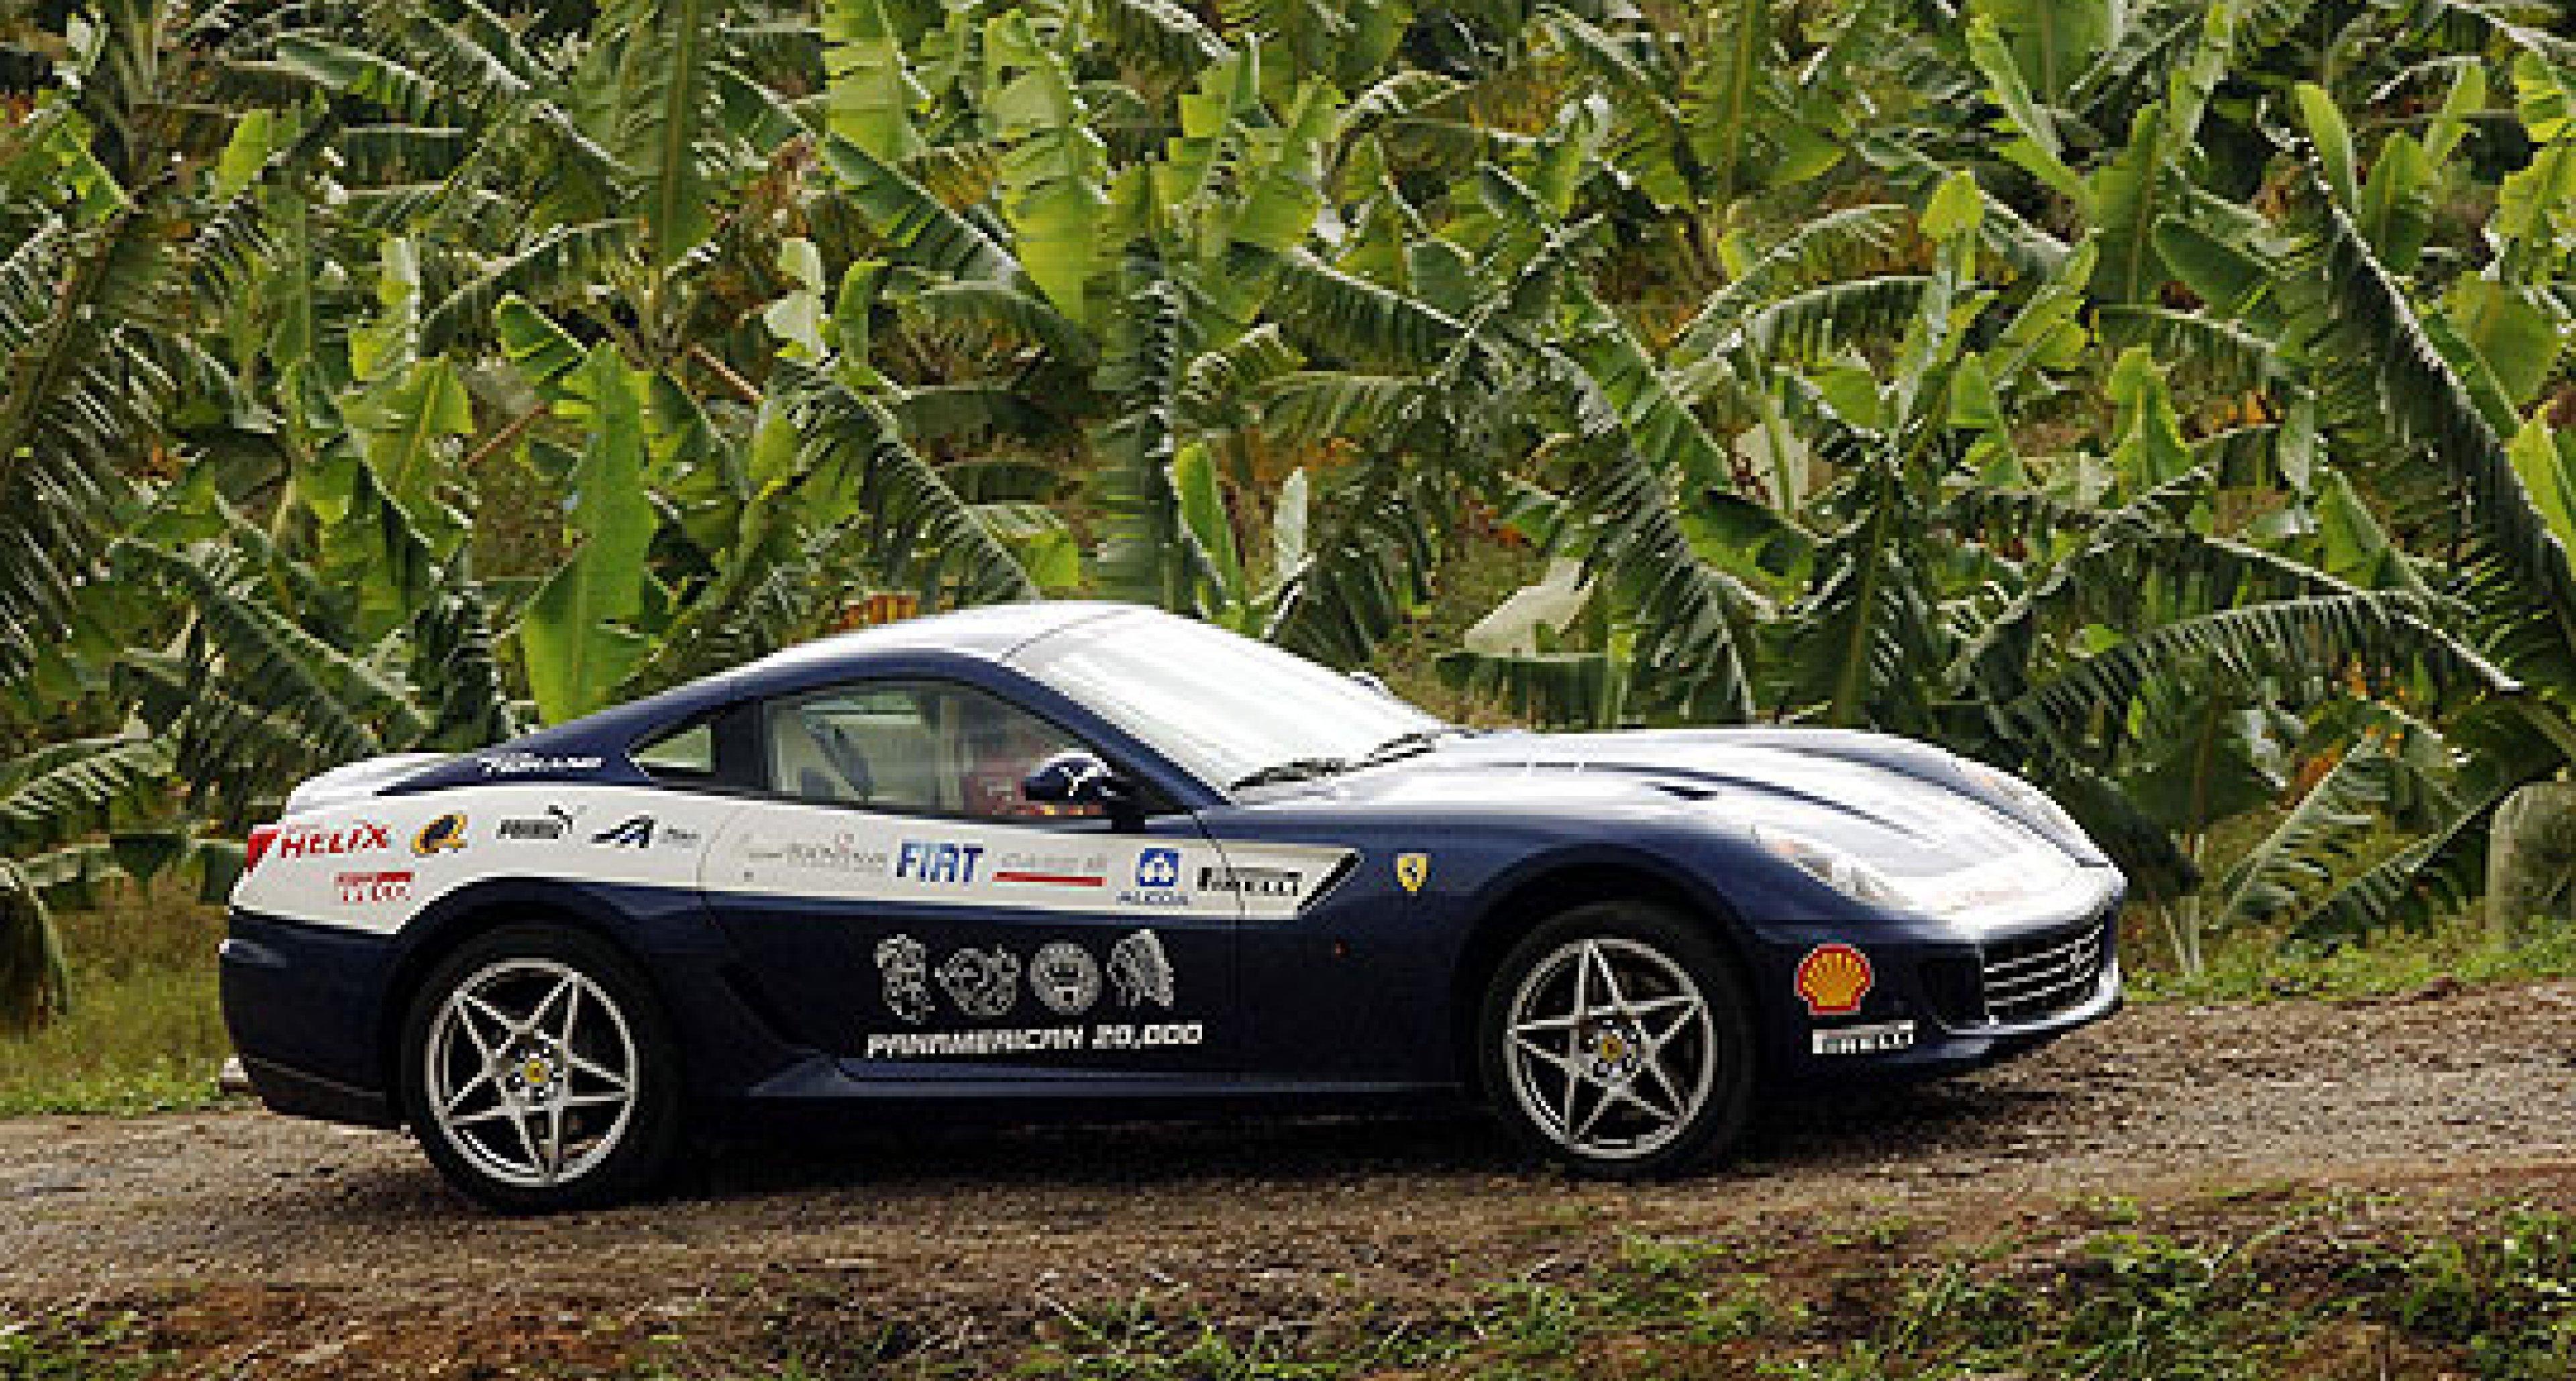 The Ferrari Panamerican 20,000 - the journey begins